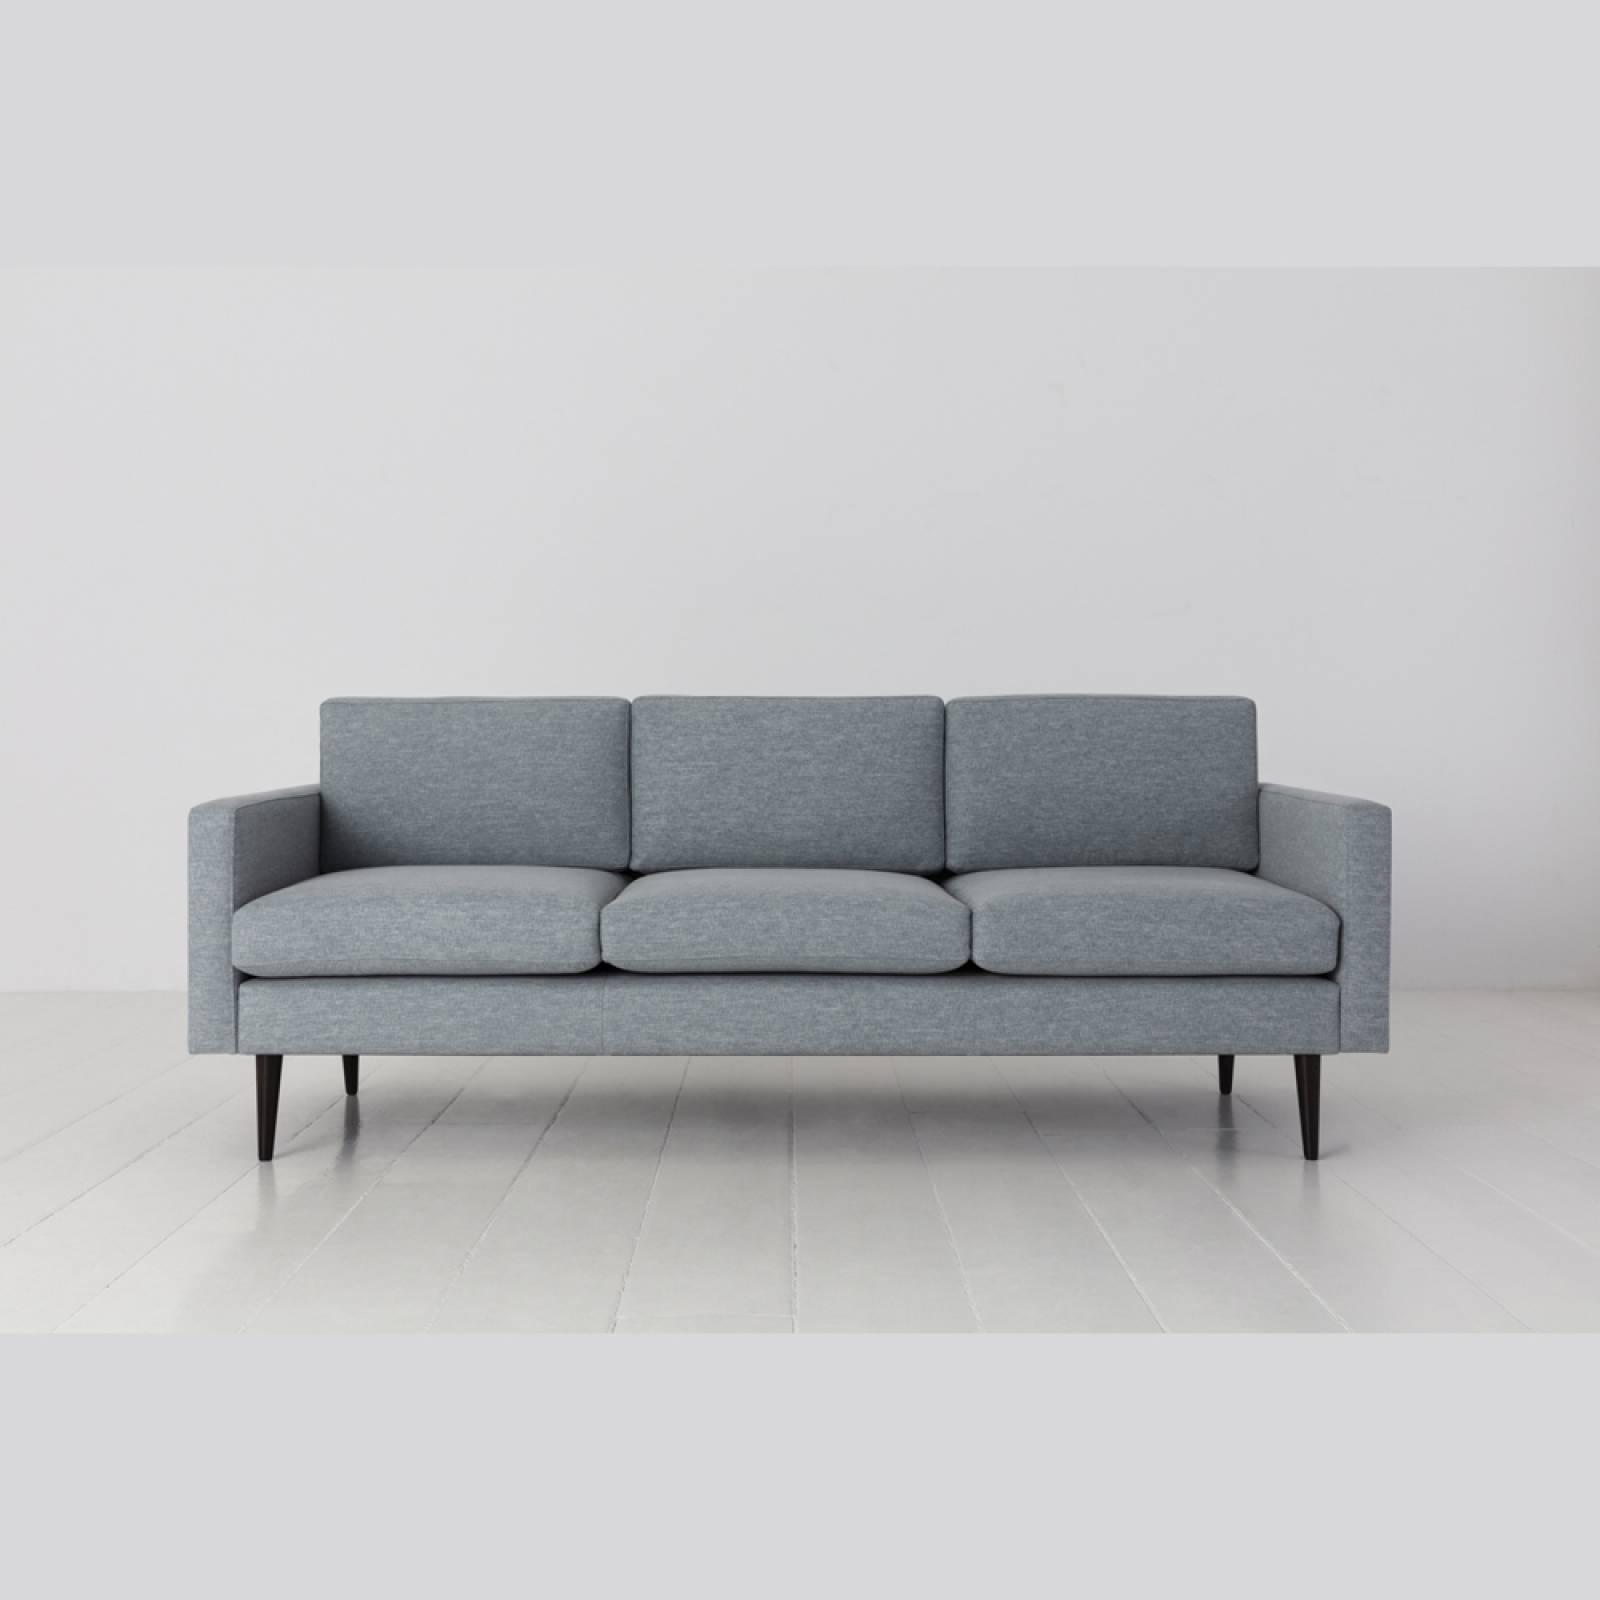 Swyft - Model 01 - 3 Seater Sofa - Linen Seaglass